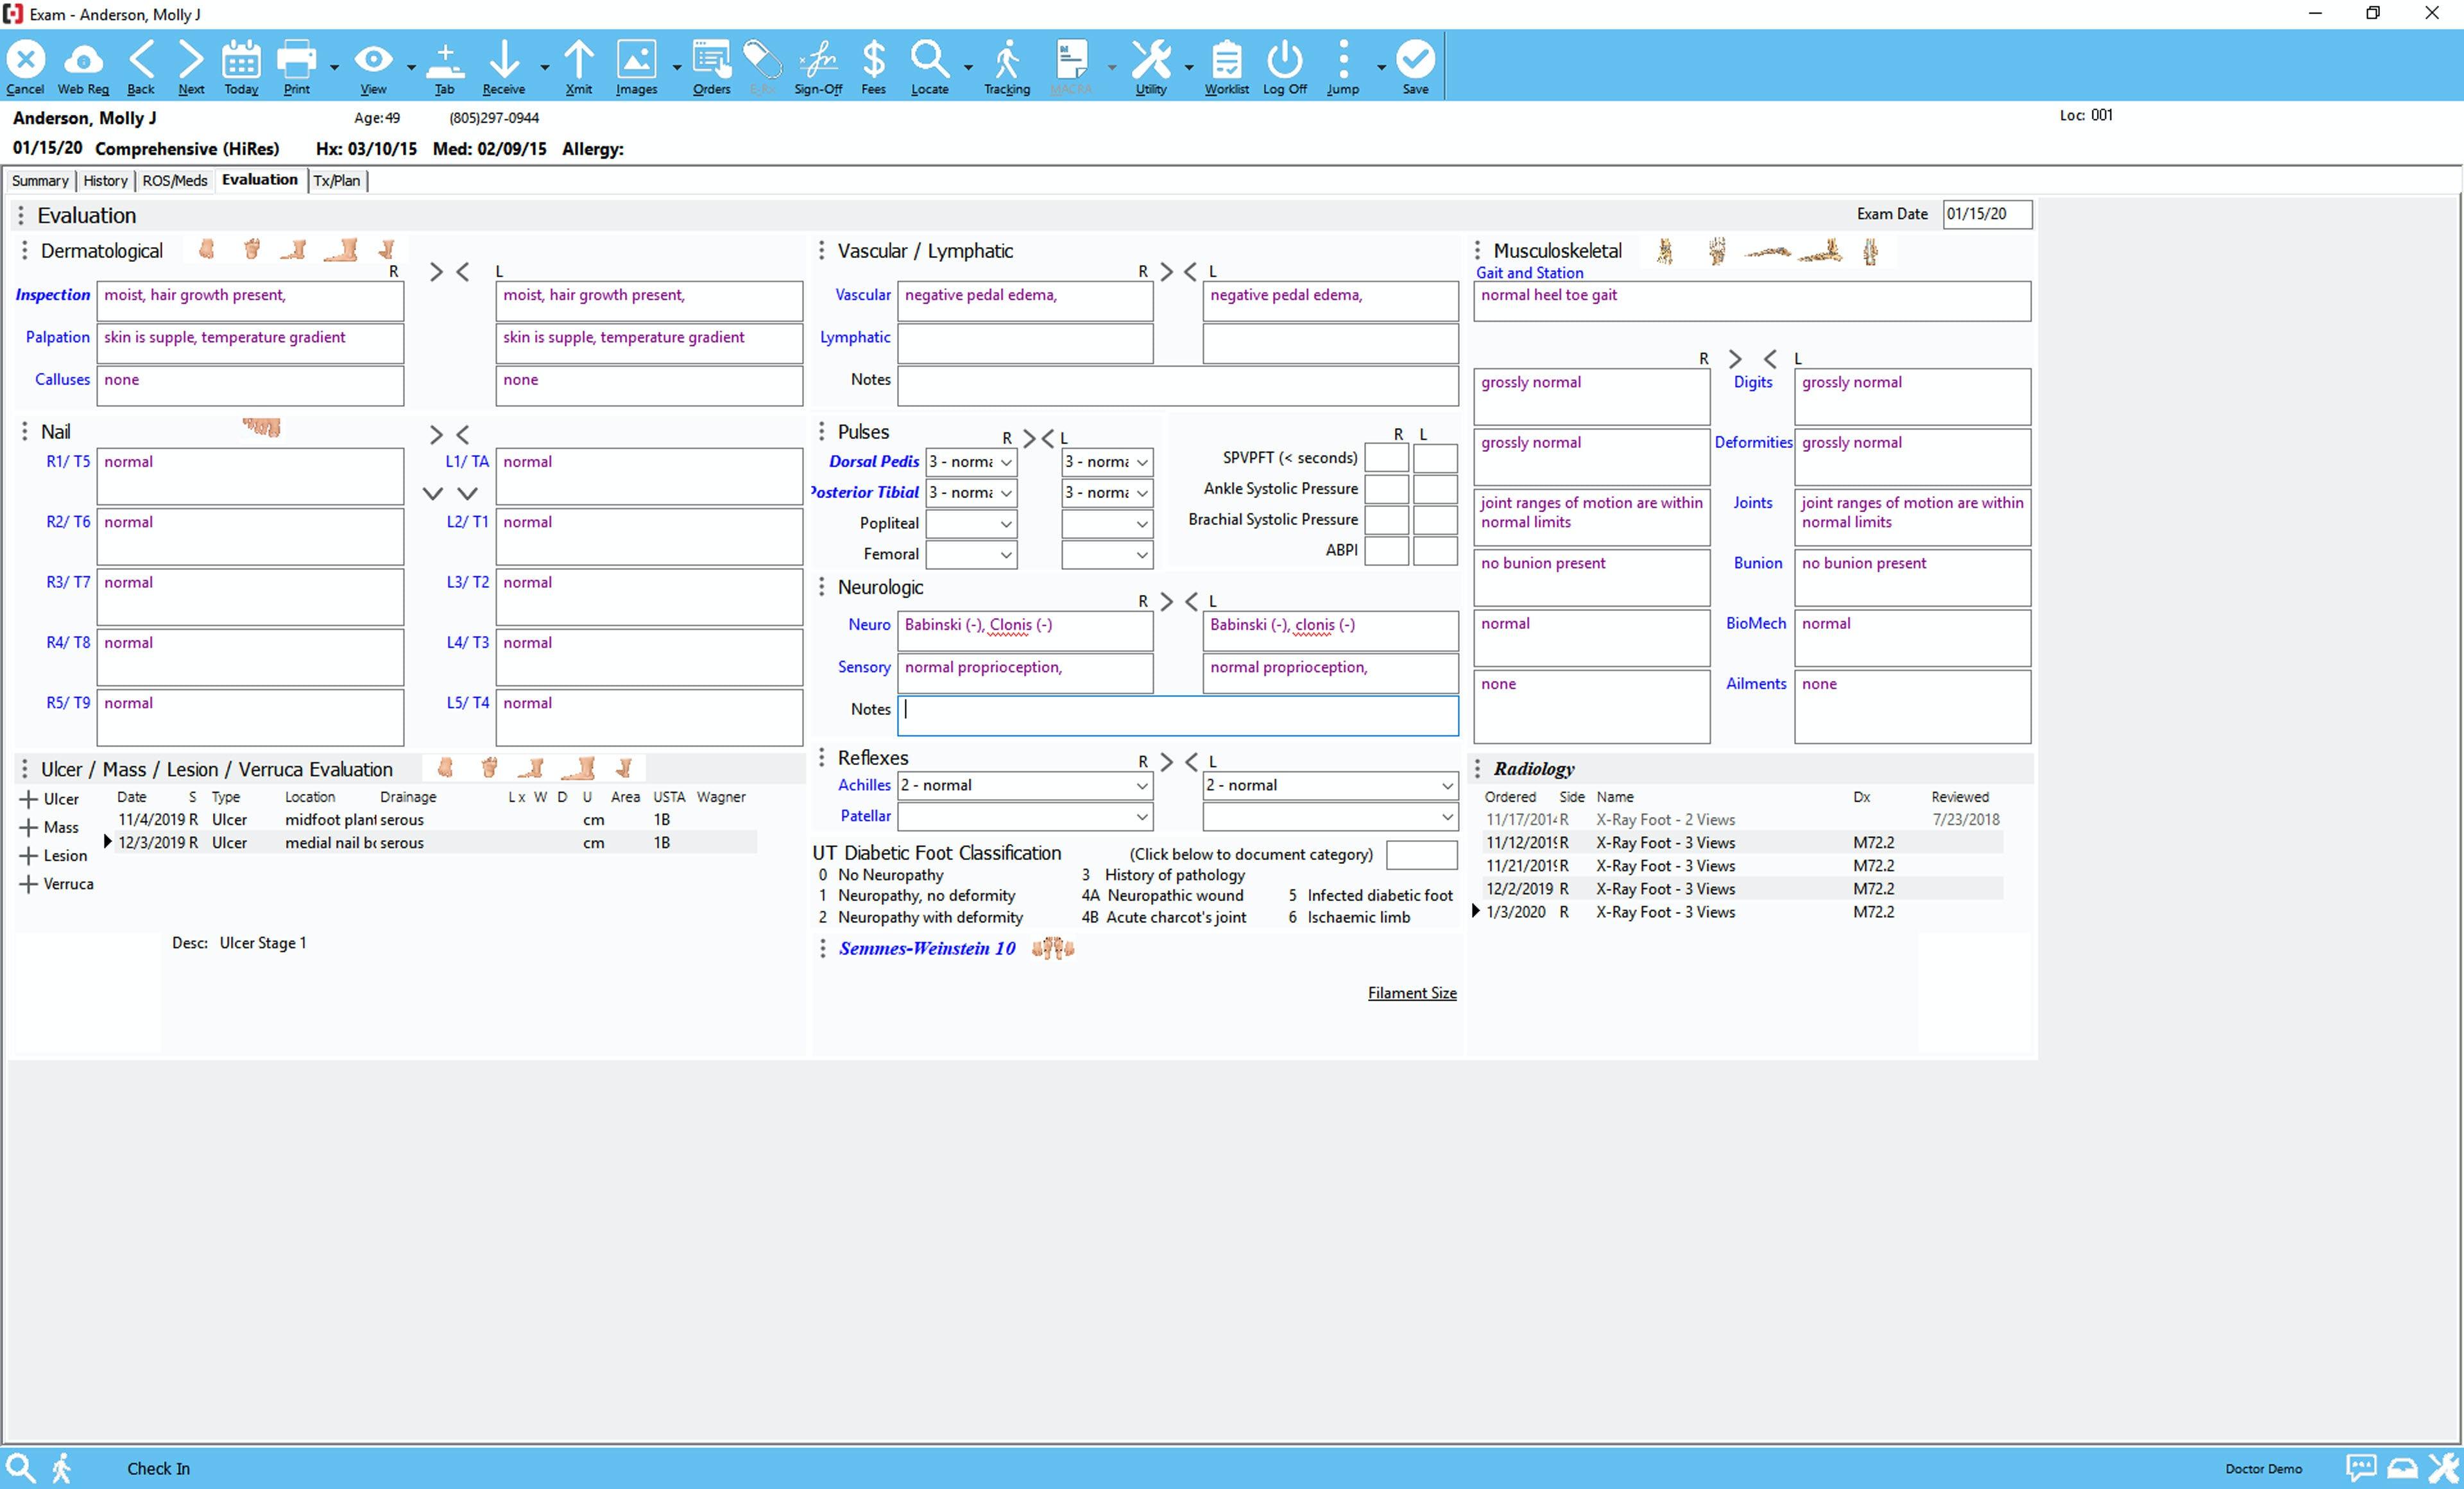 Compulink Healthcare Solutions Software - Podiatry